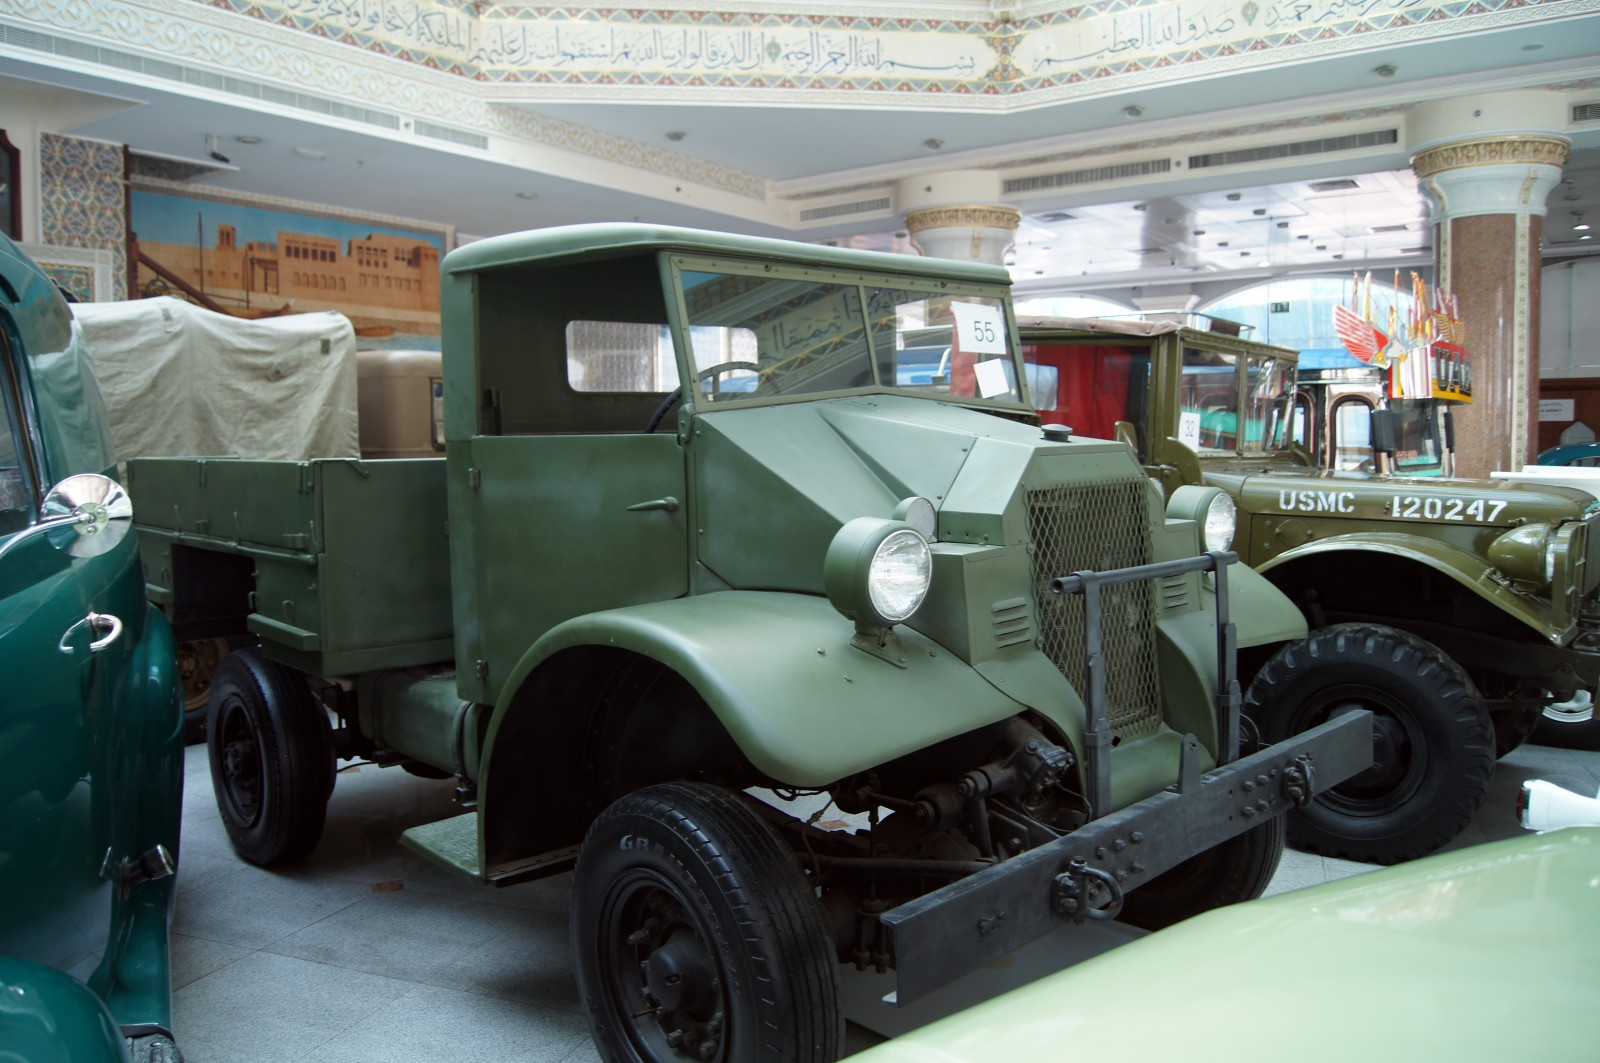 1939 Chevrolet C8A Museum Exhibit